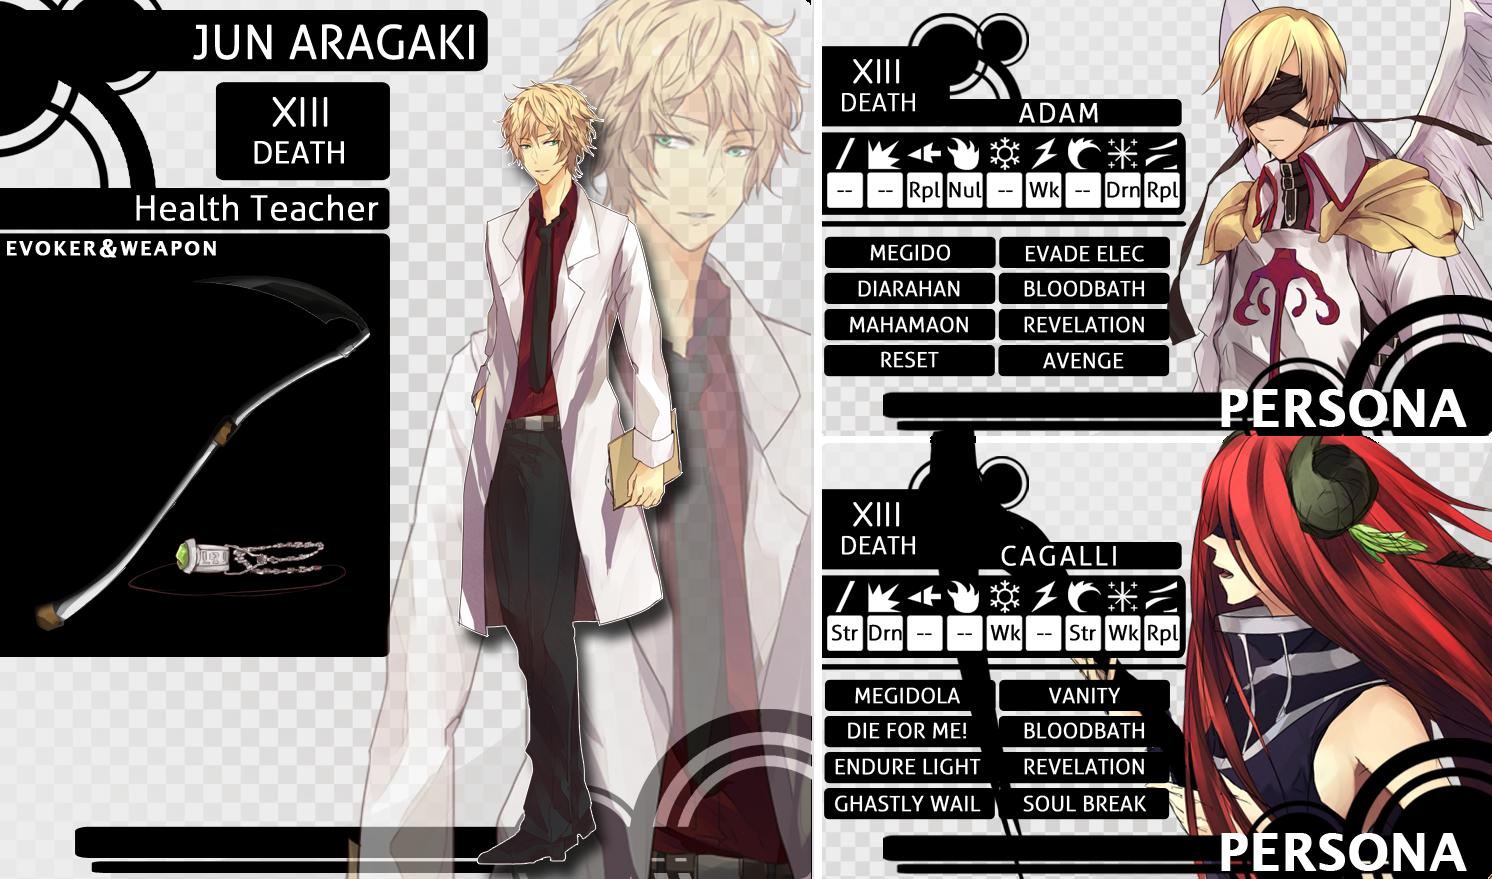 MM: Jun Aragaki by Saiko-Akarui